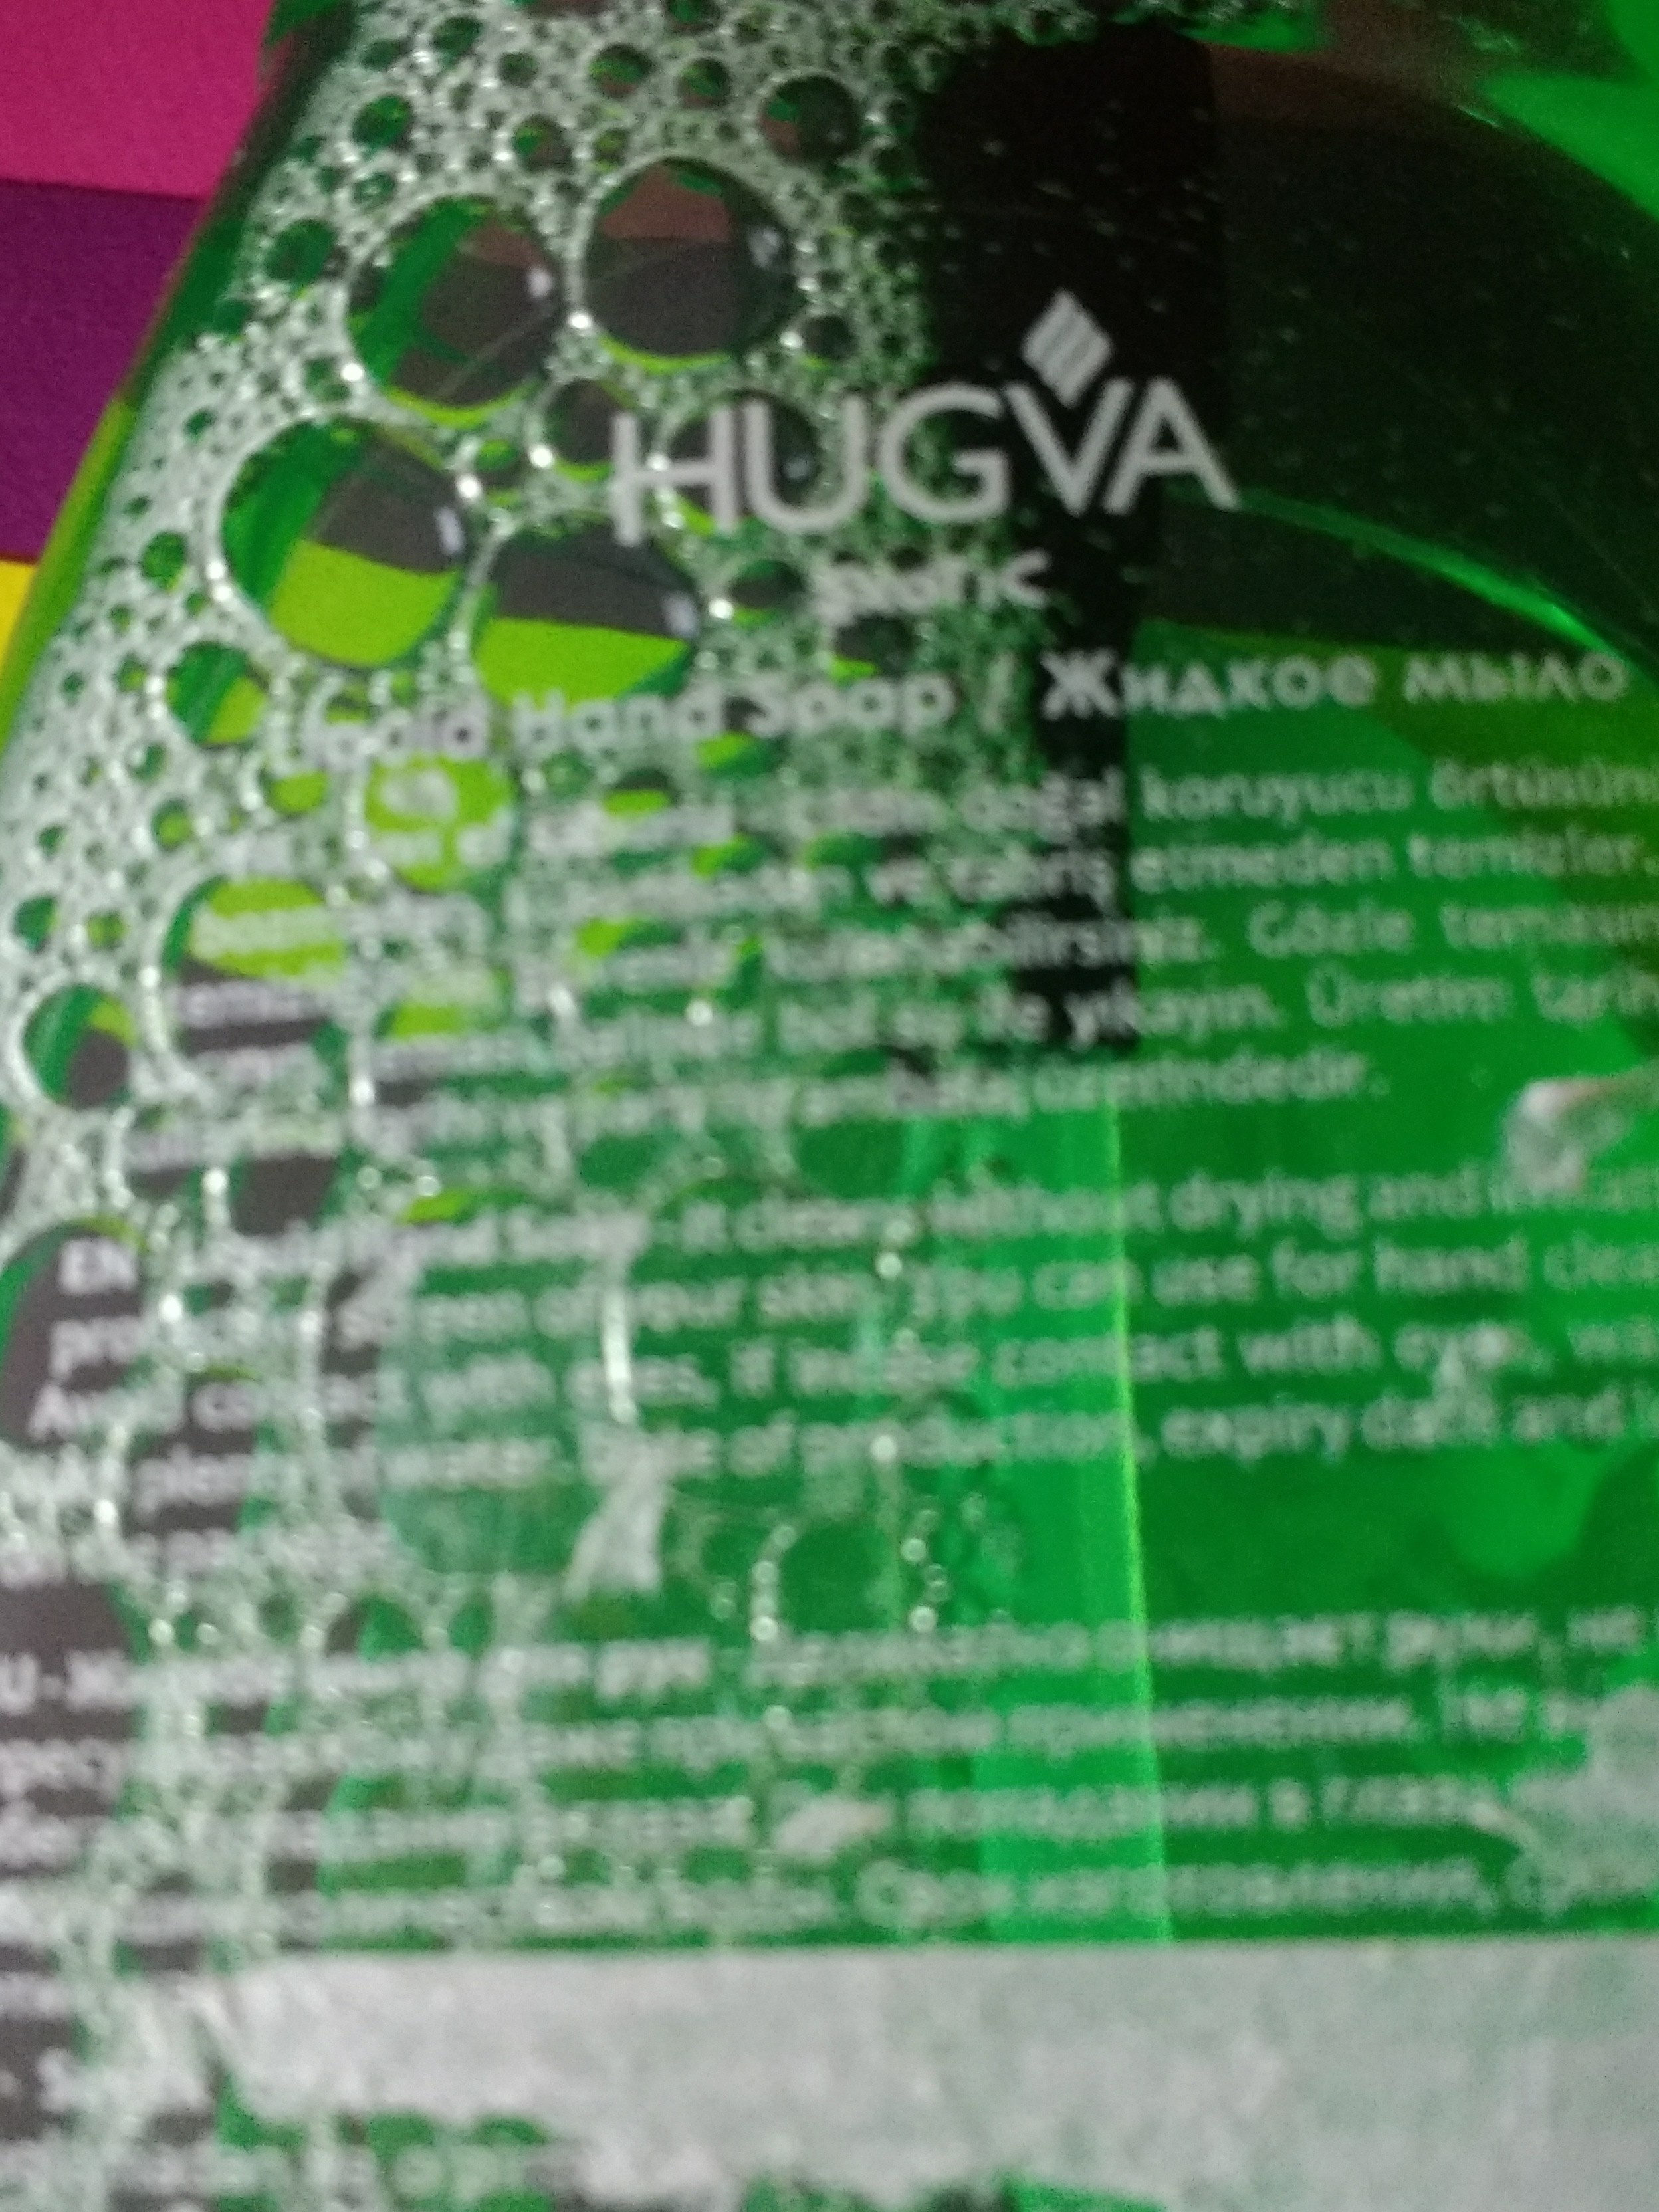 hugva - Ingredients